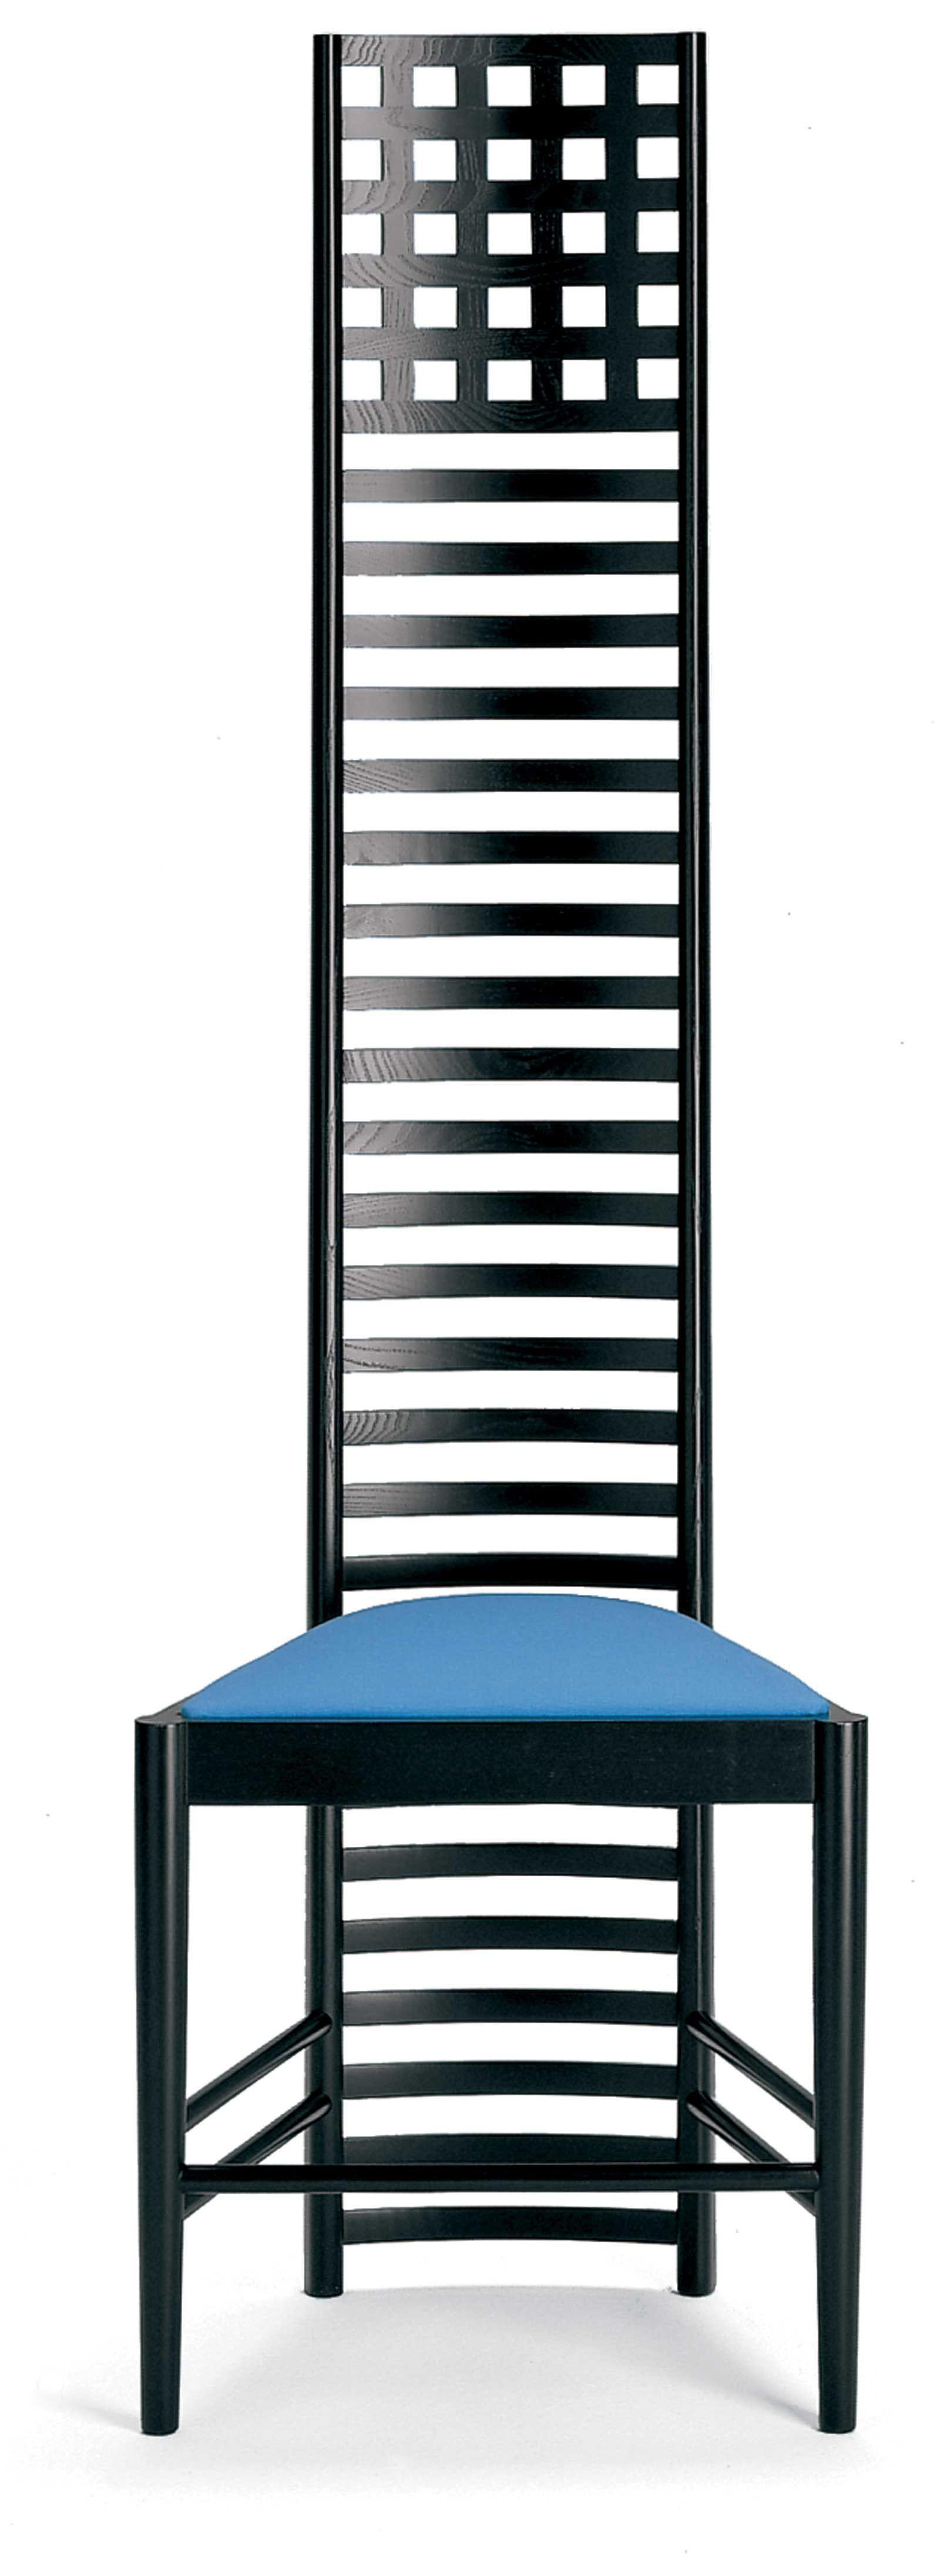 Las 10 sillas de dise o moderno m s famosas sillas for Sillas famosas diseno industrial